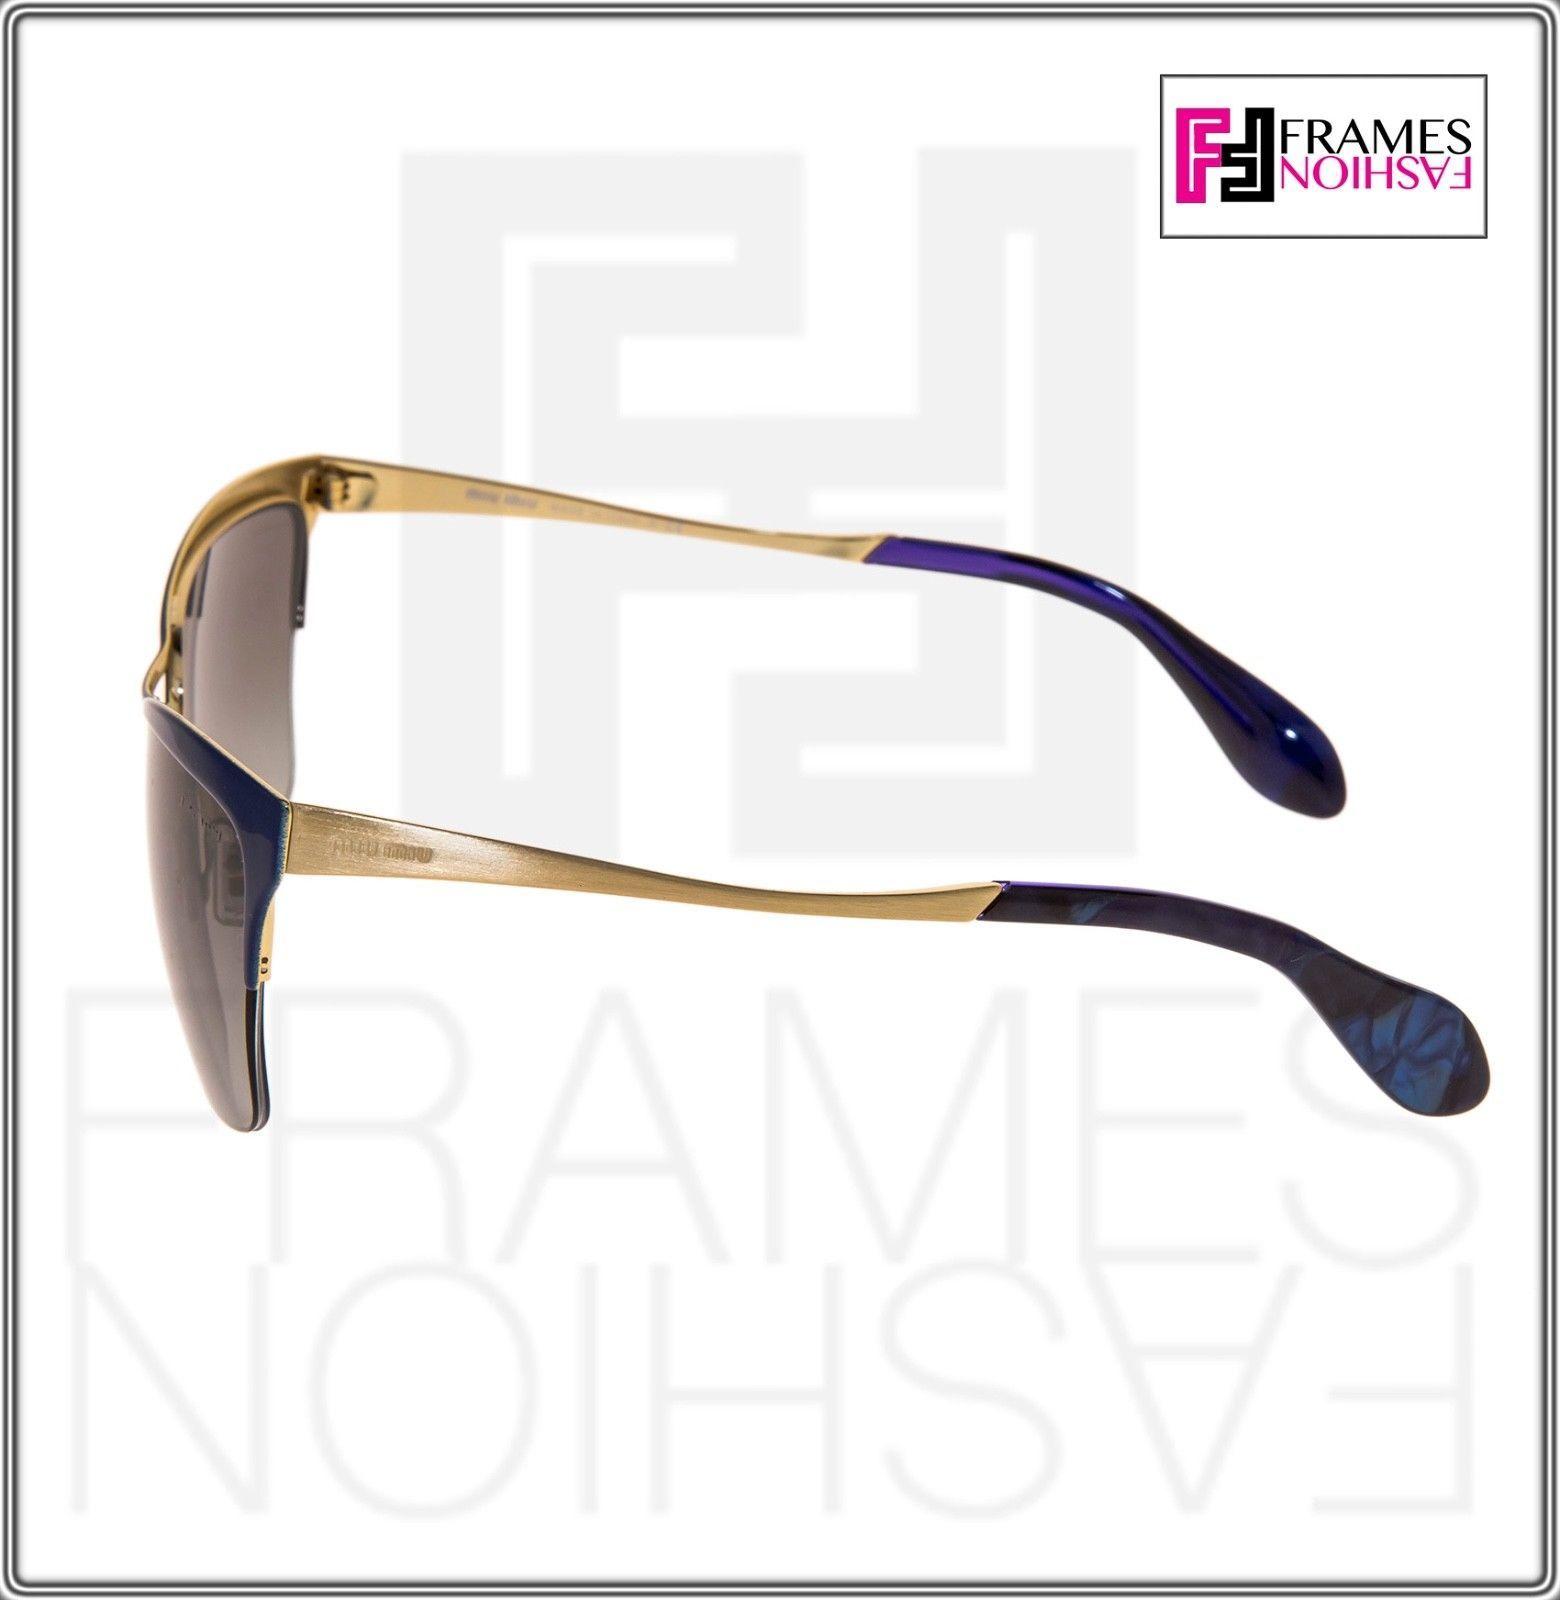 MIU MIU So Metal 50P Cat eye Sunglasses NAE-3M1 Gold Blue Gradient MU50PS